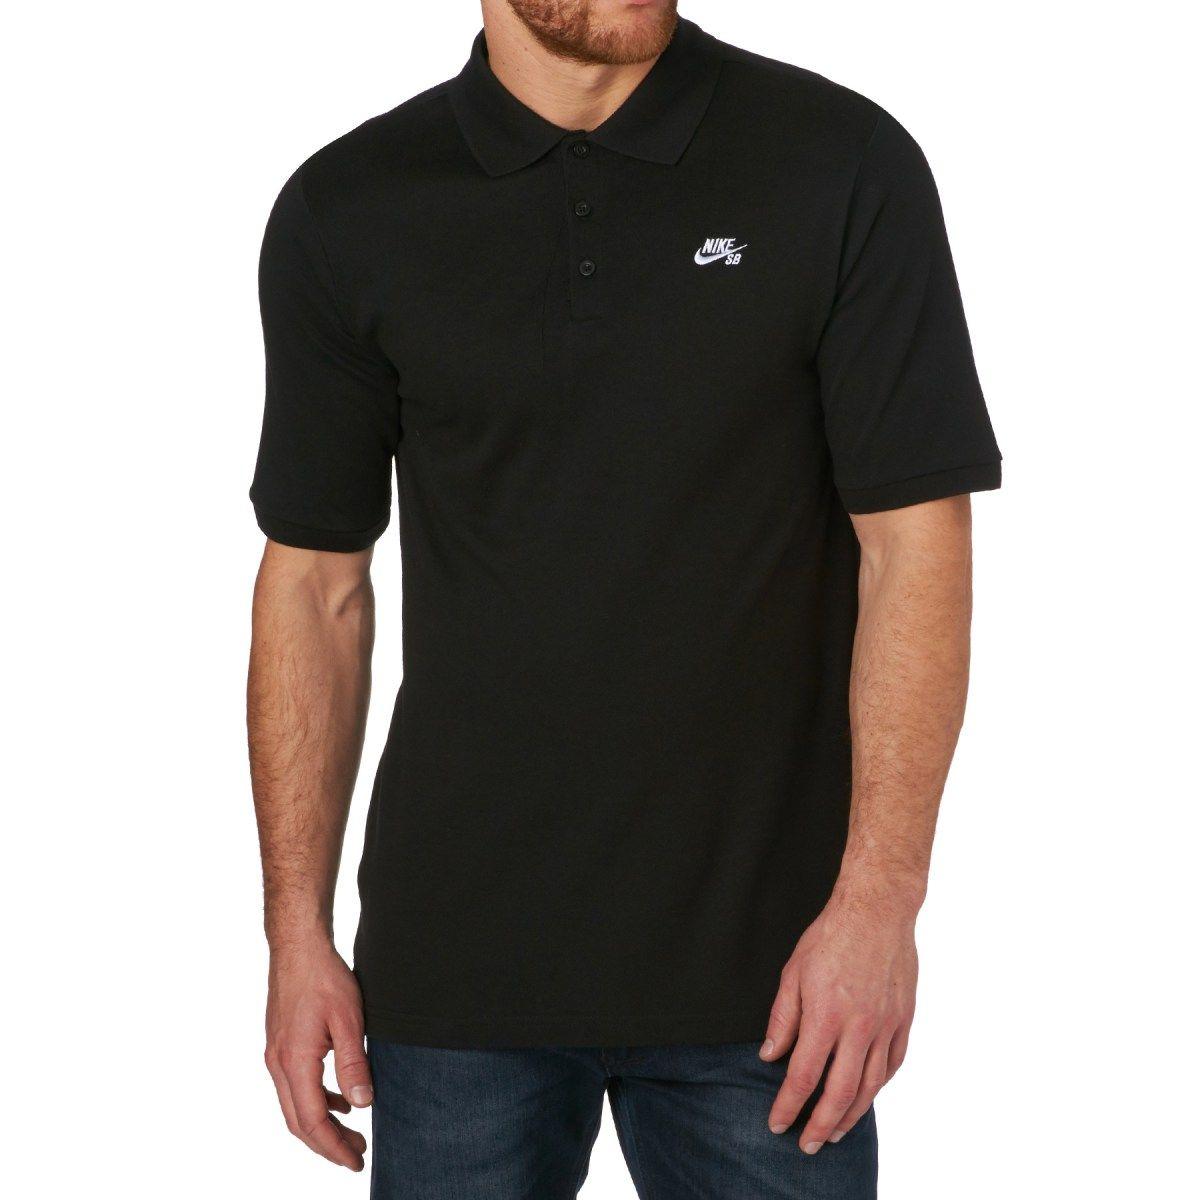 hot sale online ebf74 d4c05 Men s Nike Skateboarding Rugby Tops - Nike SB DRI-FIT Pique Polo Shirt -  Black